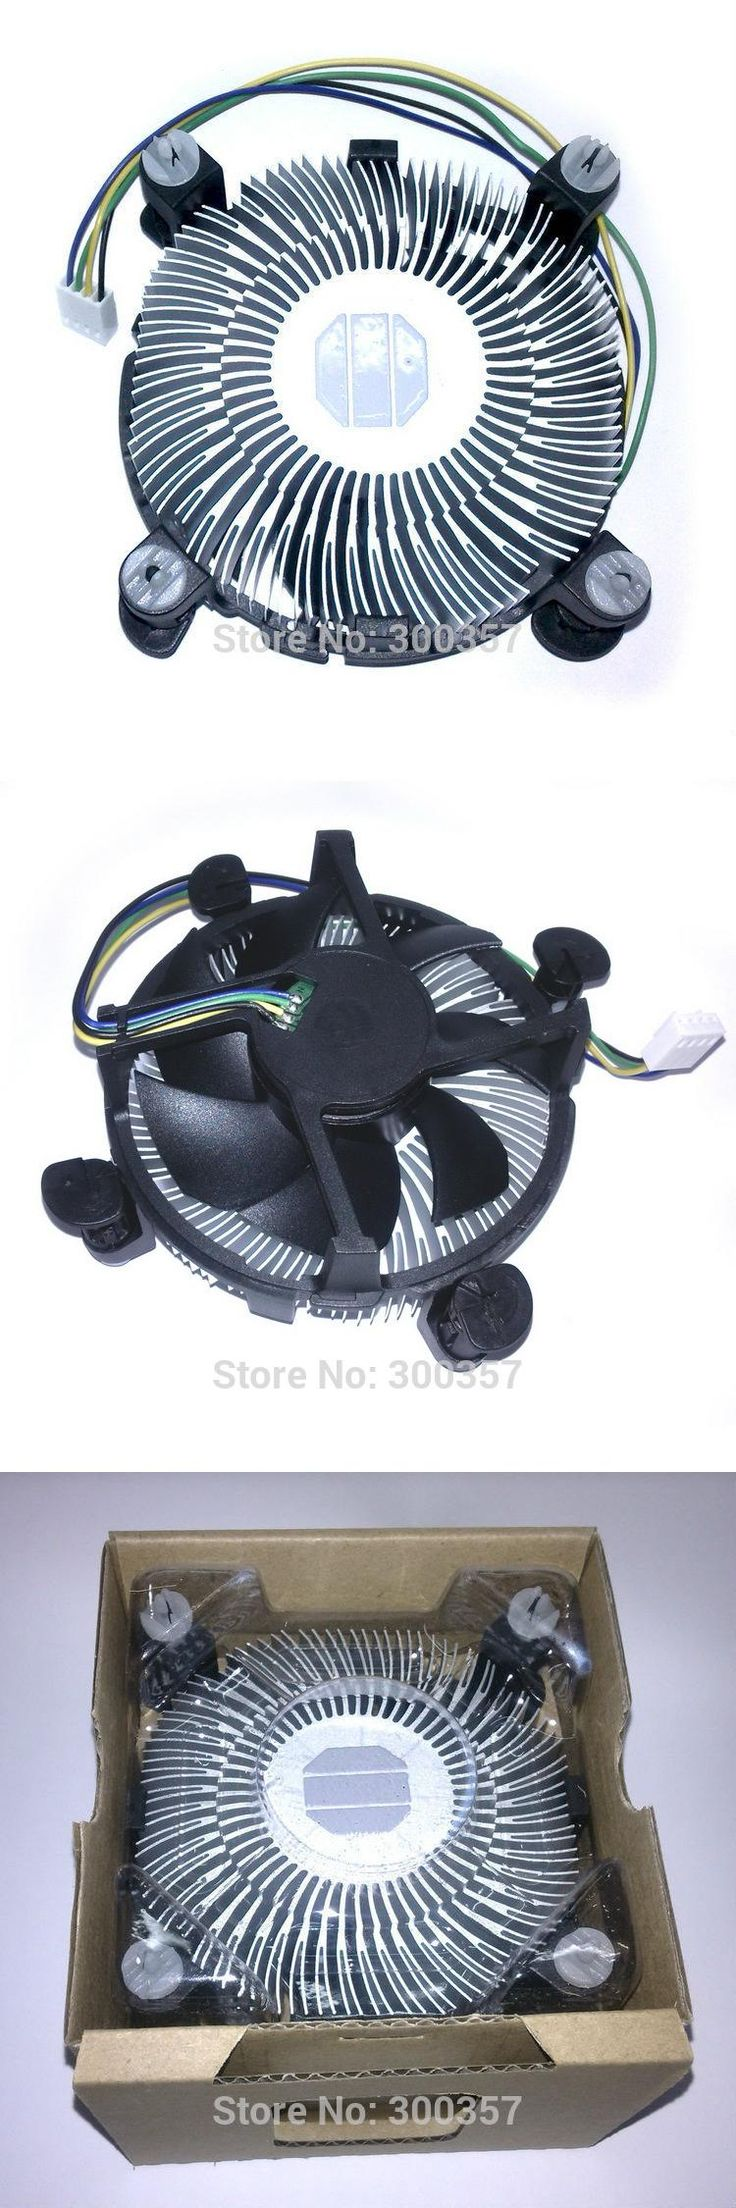 [Visit to Buy] 4 PinDesktop Computer PC Aluminum CPU Heatsink cheap Cooler Fan for LGA 775 or LGA1155/1156/1150 3type #Advertisement